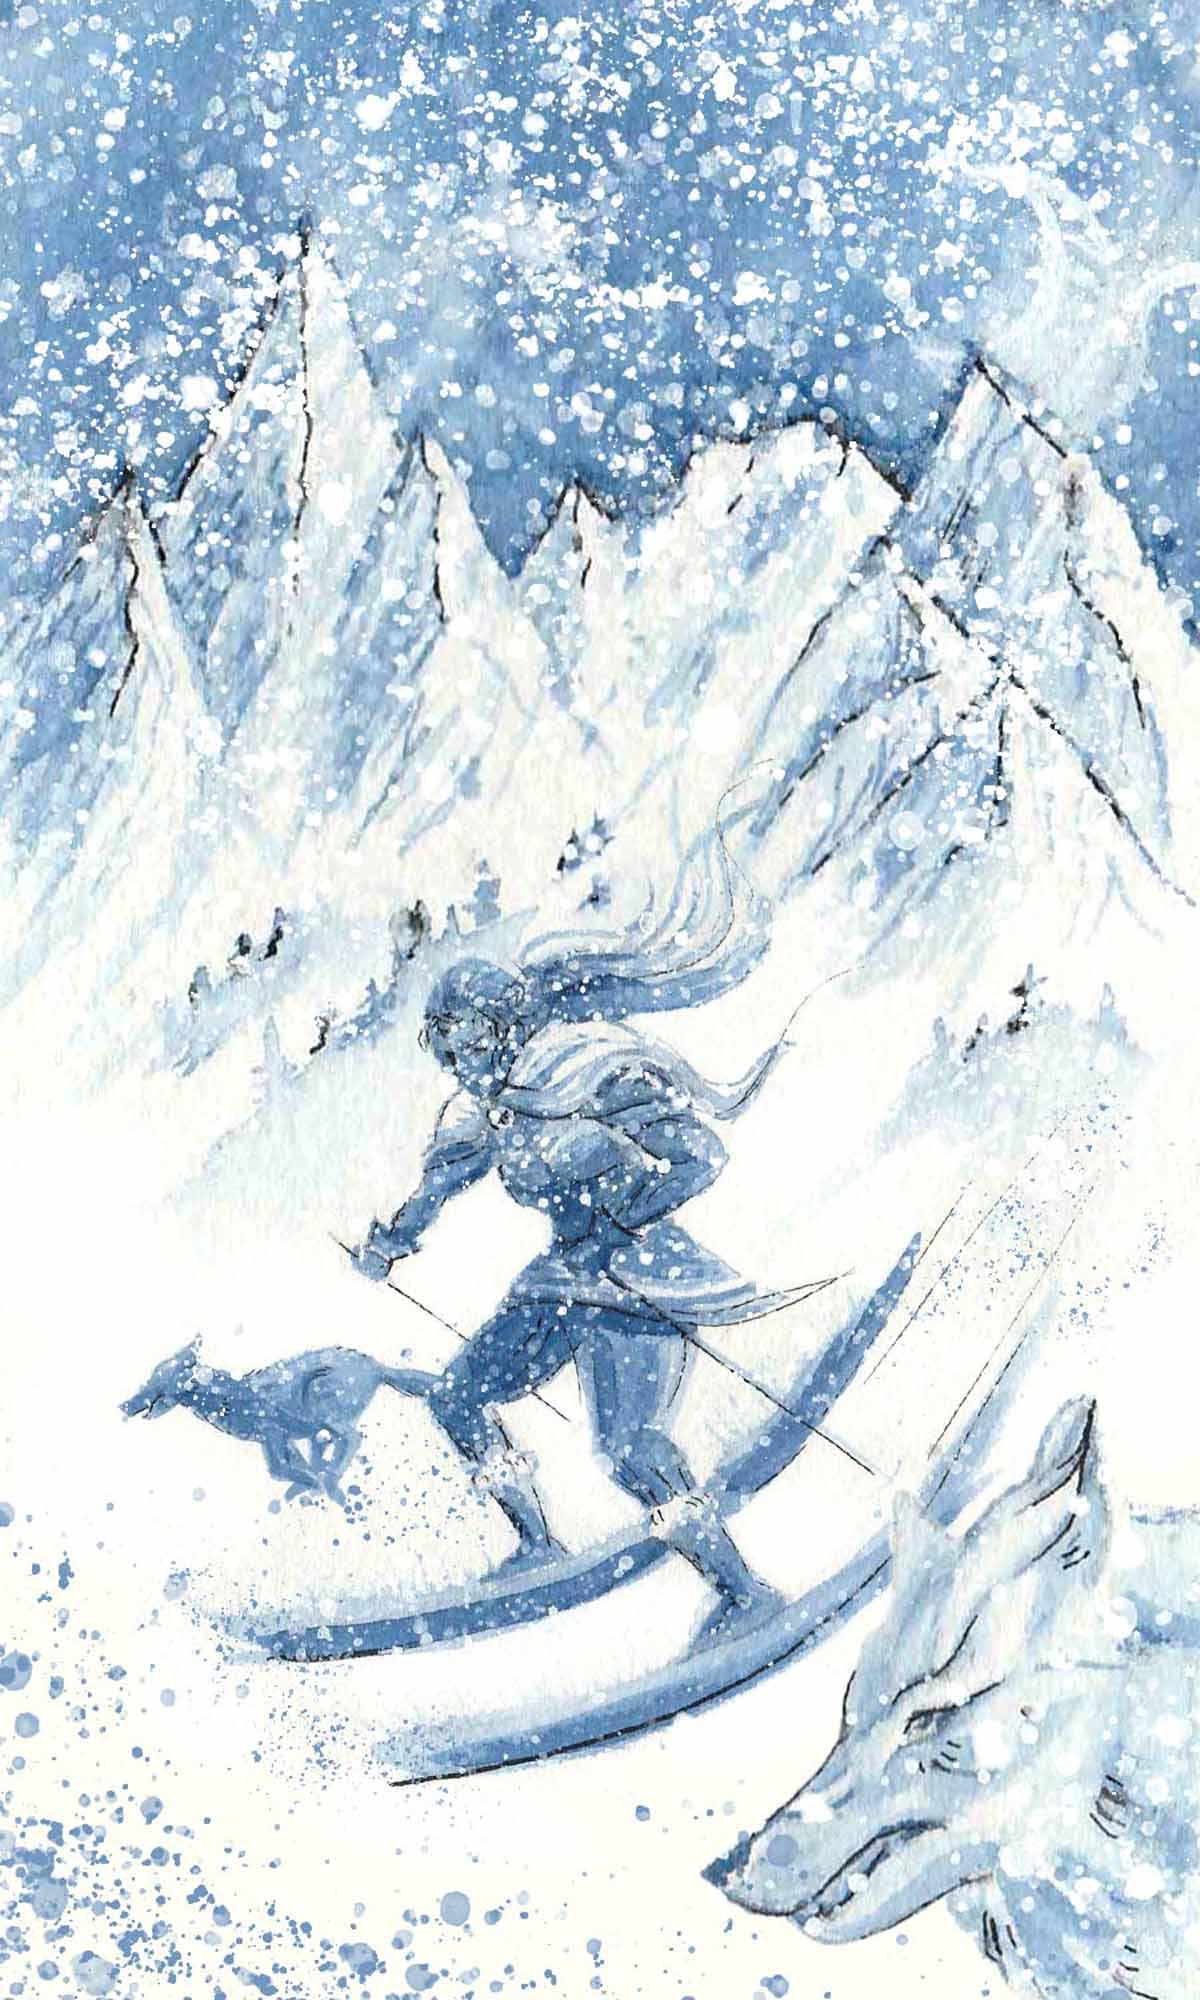 The-Long-Lost-Ski-Goddess-Nikkey-Dawn-illustration